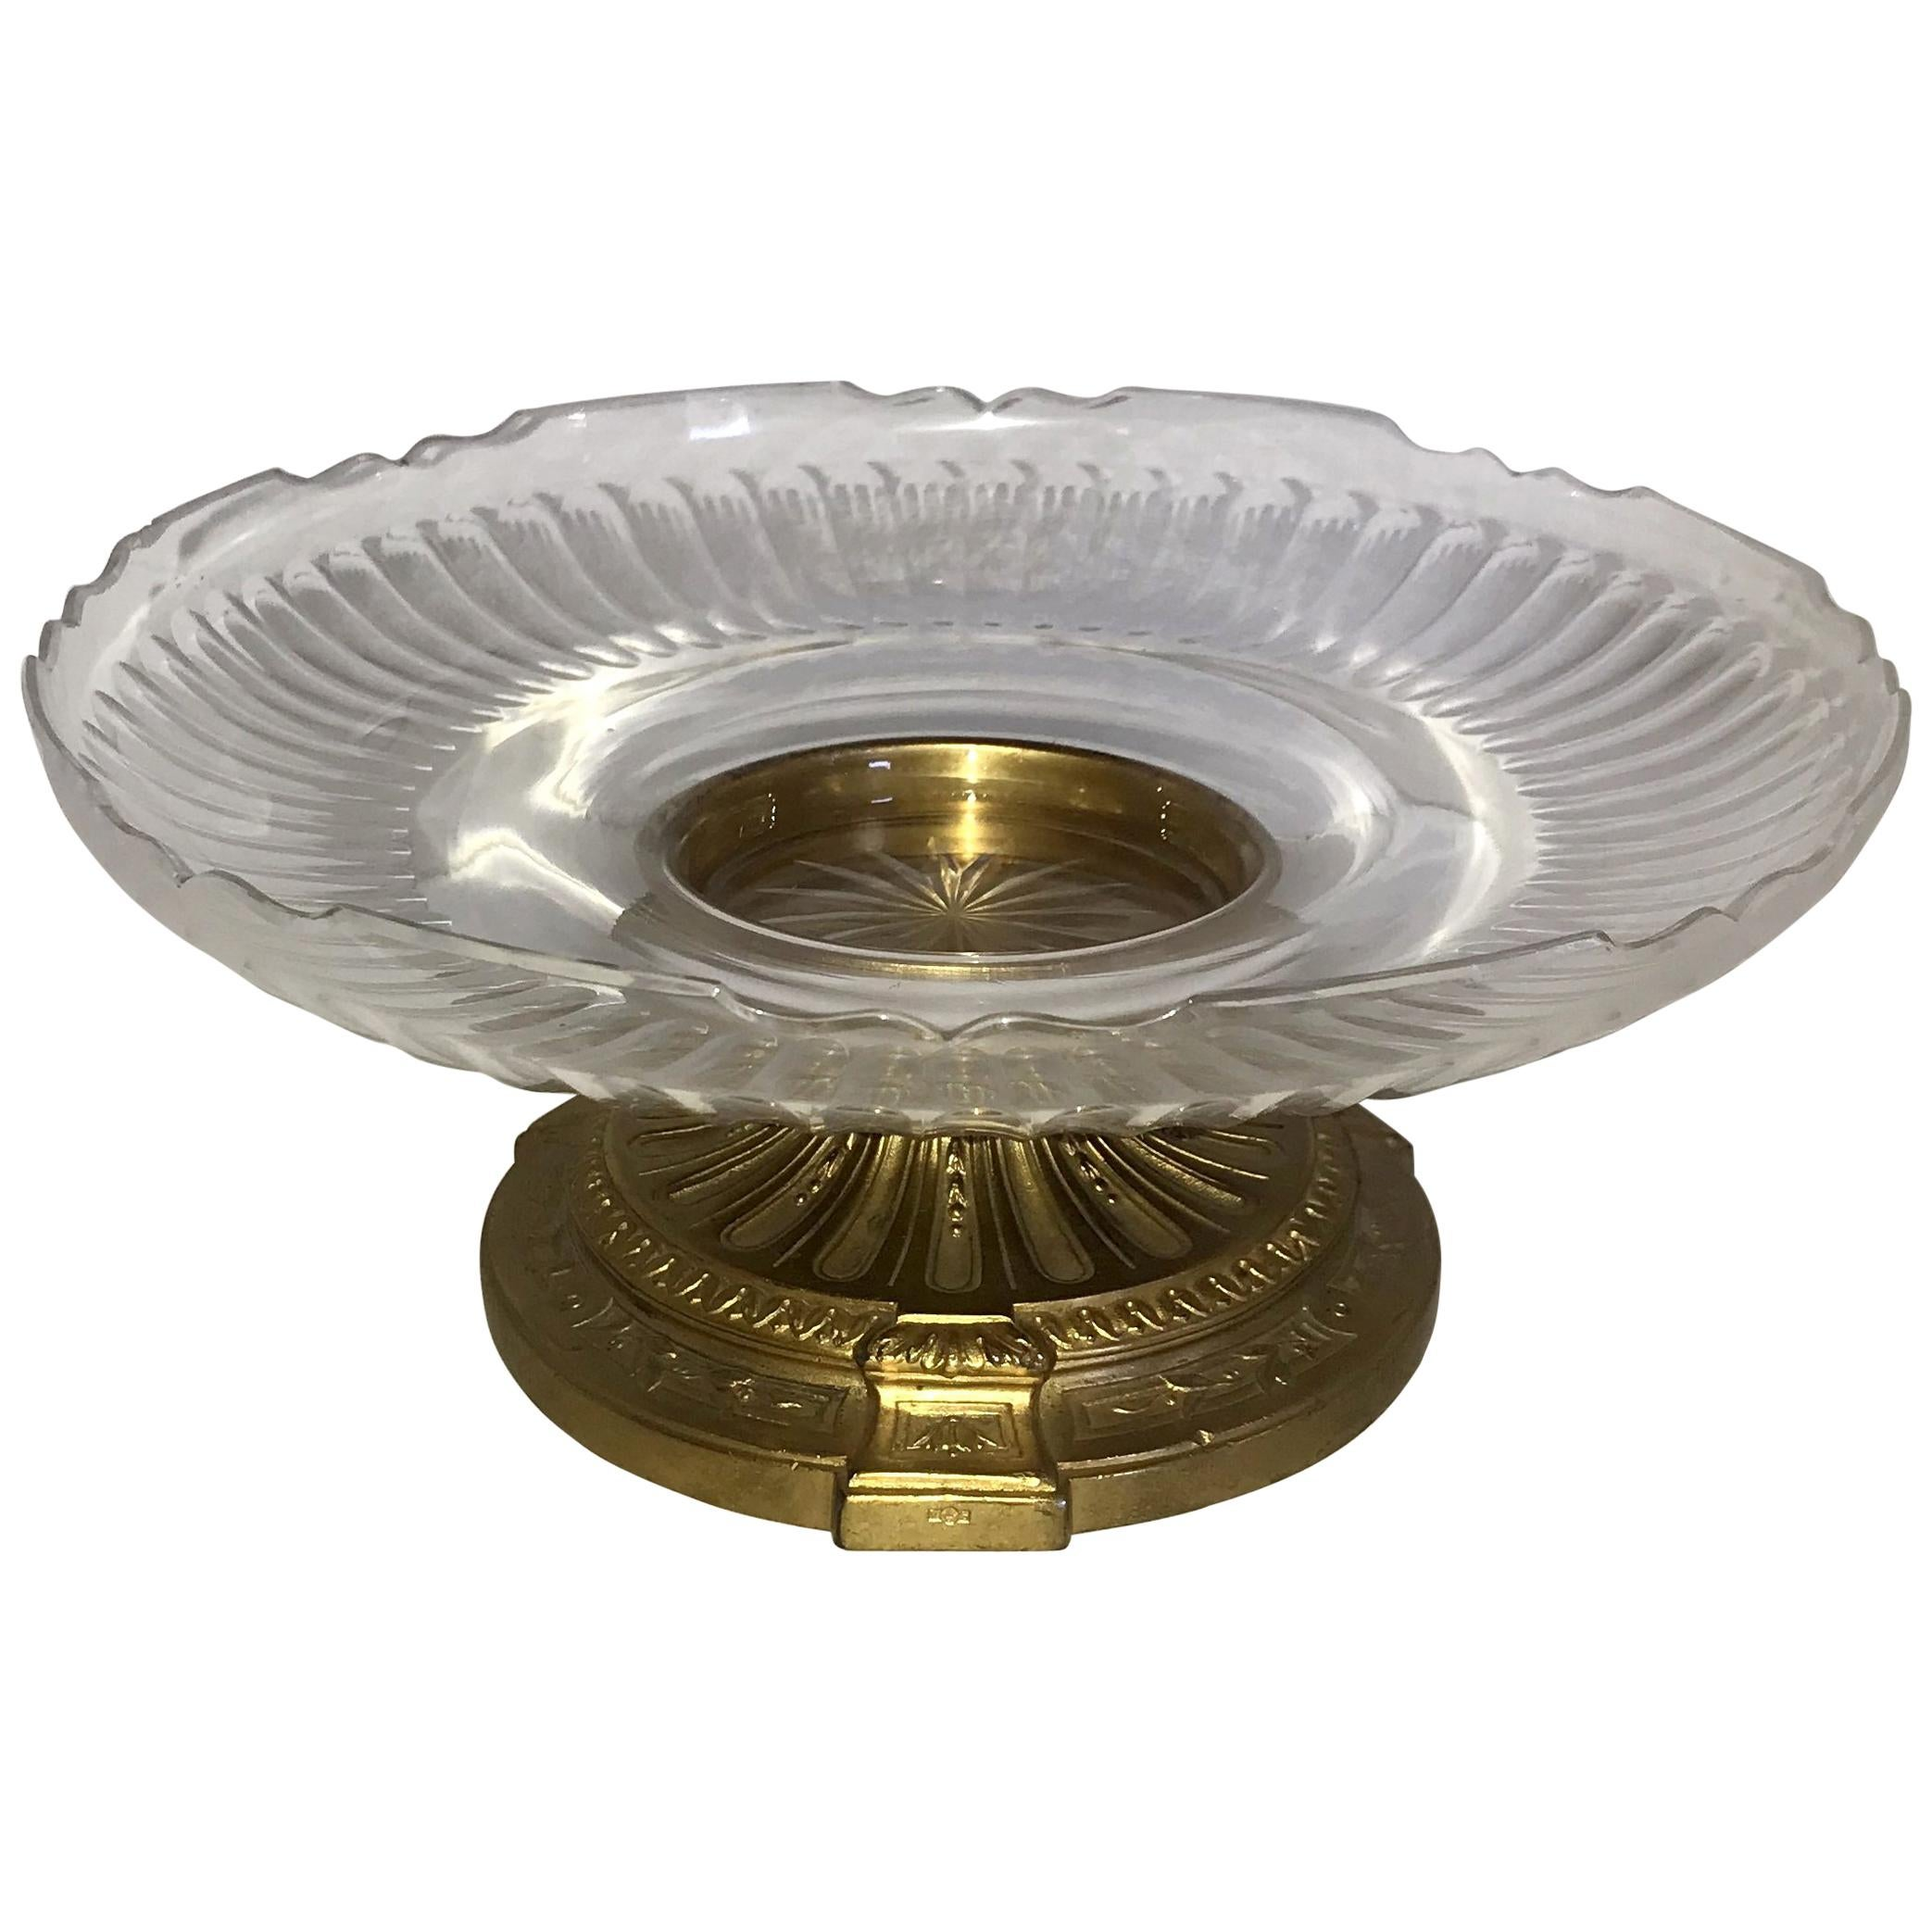 Wonderful French Neoclassical Bronze Crystal Round Centrepiece Cake Ormolu Stand